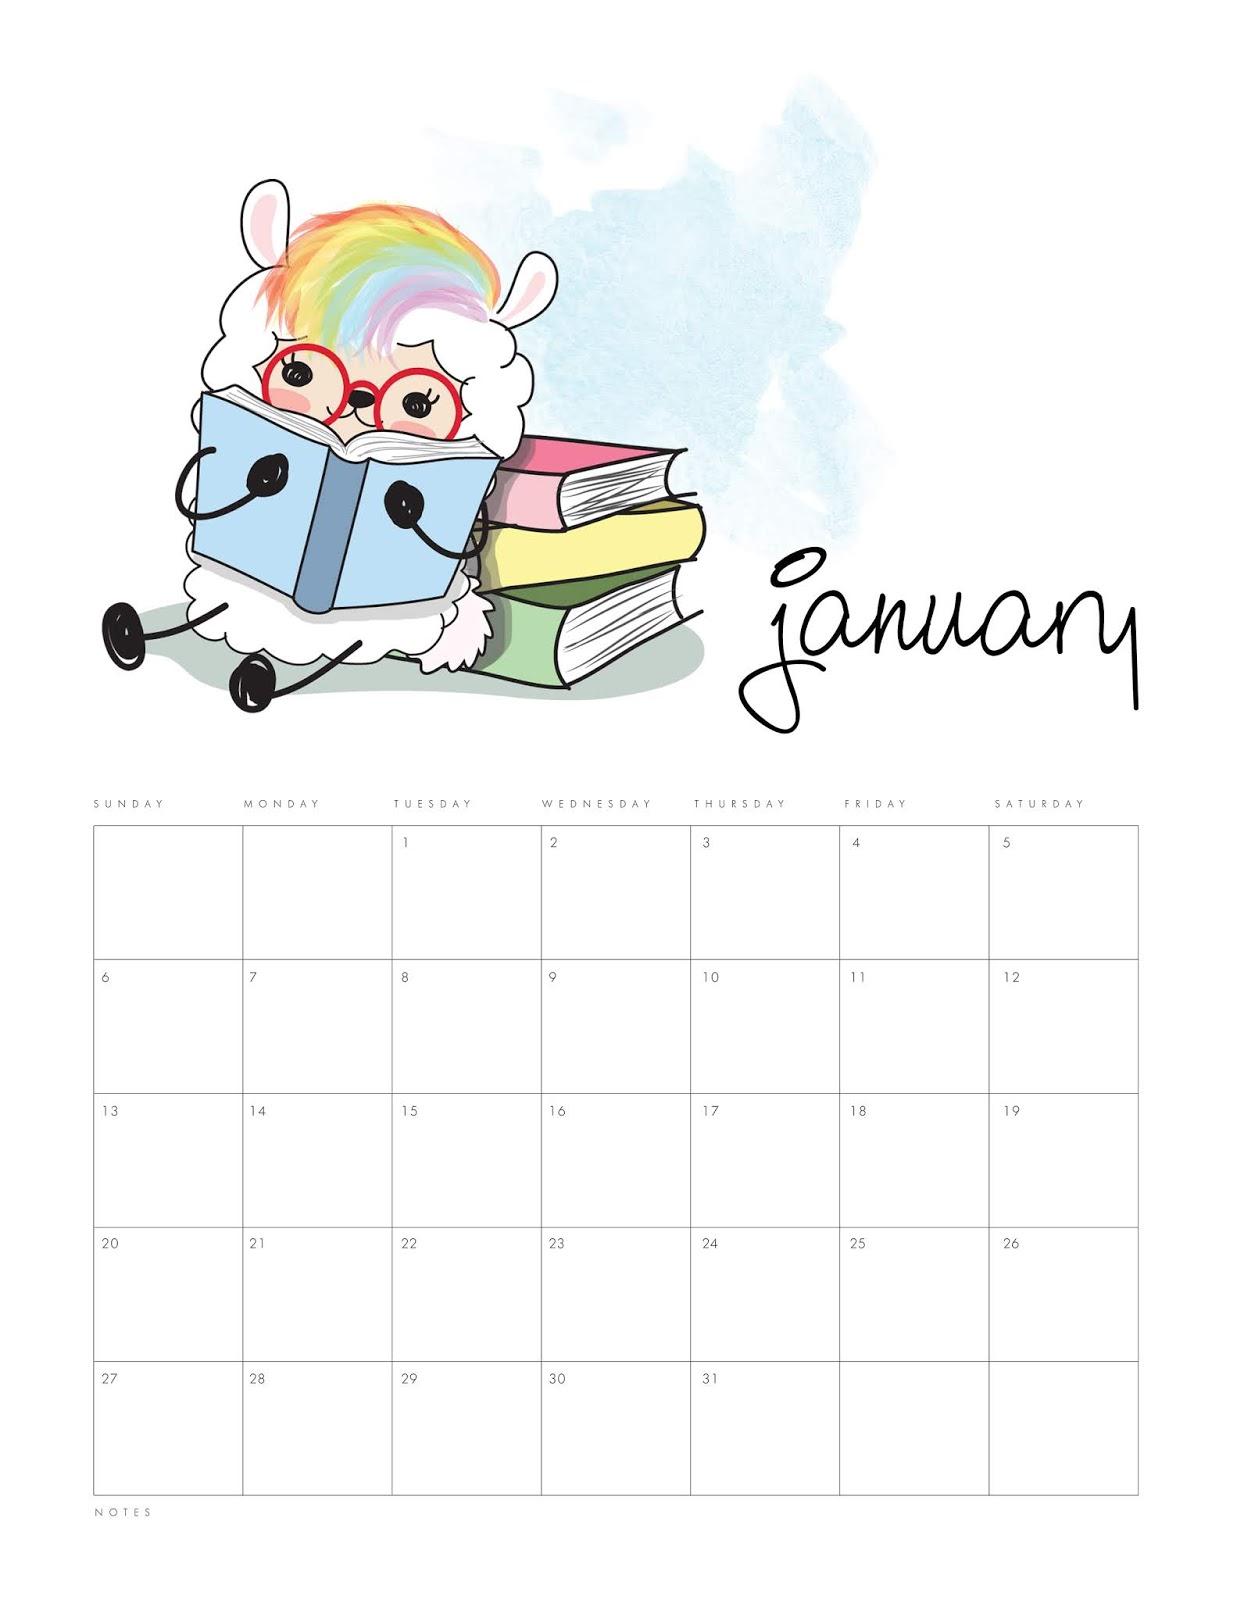 Calendario 2019 Disney Para Imprimir.Llama Kawaii Calendario 2019 Para Imprimir Gratis Ideas